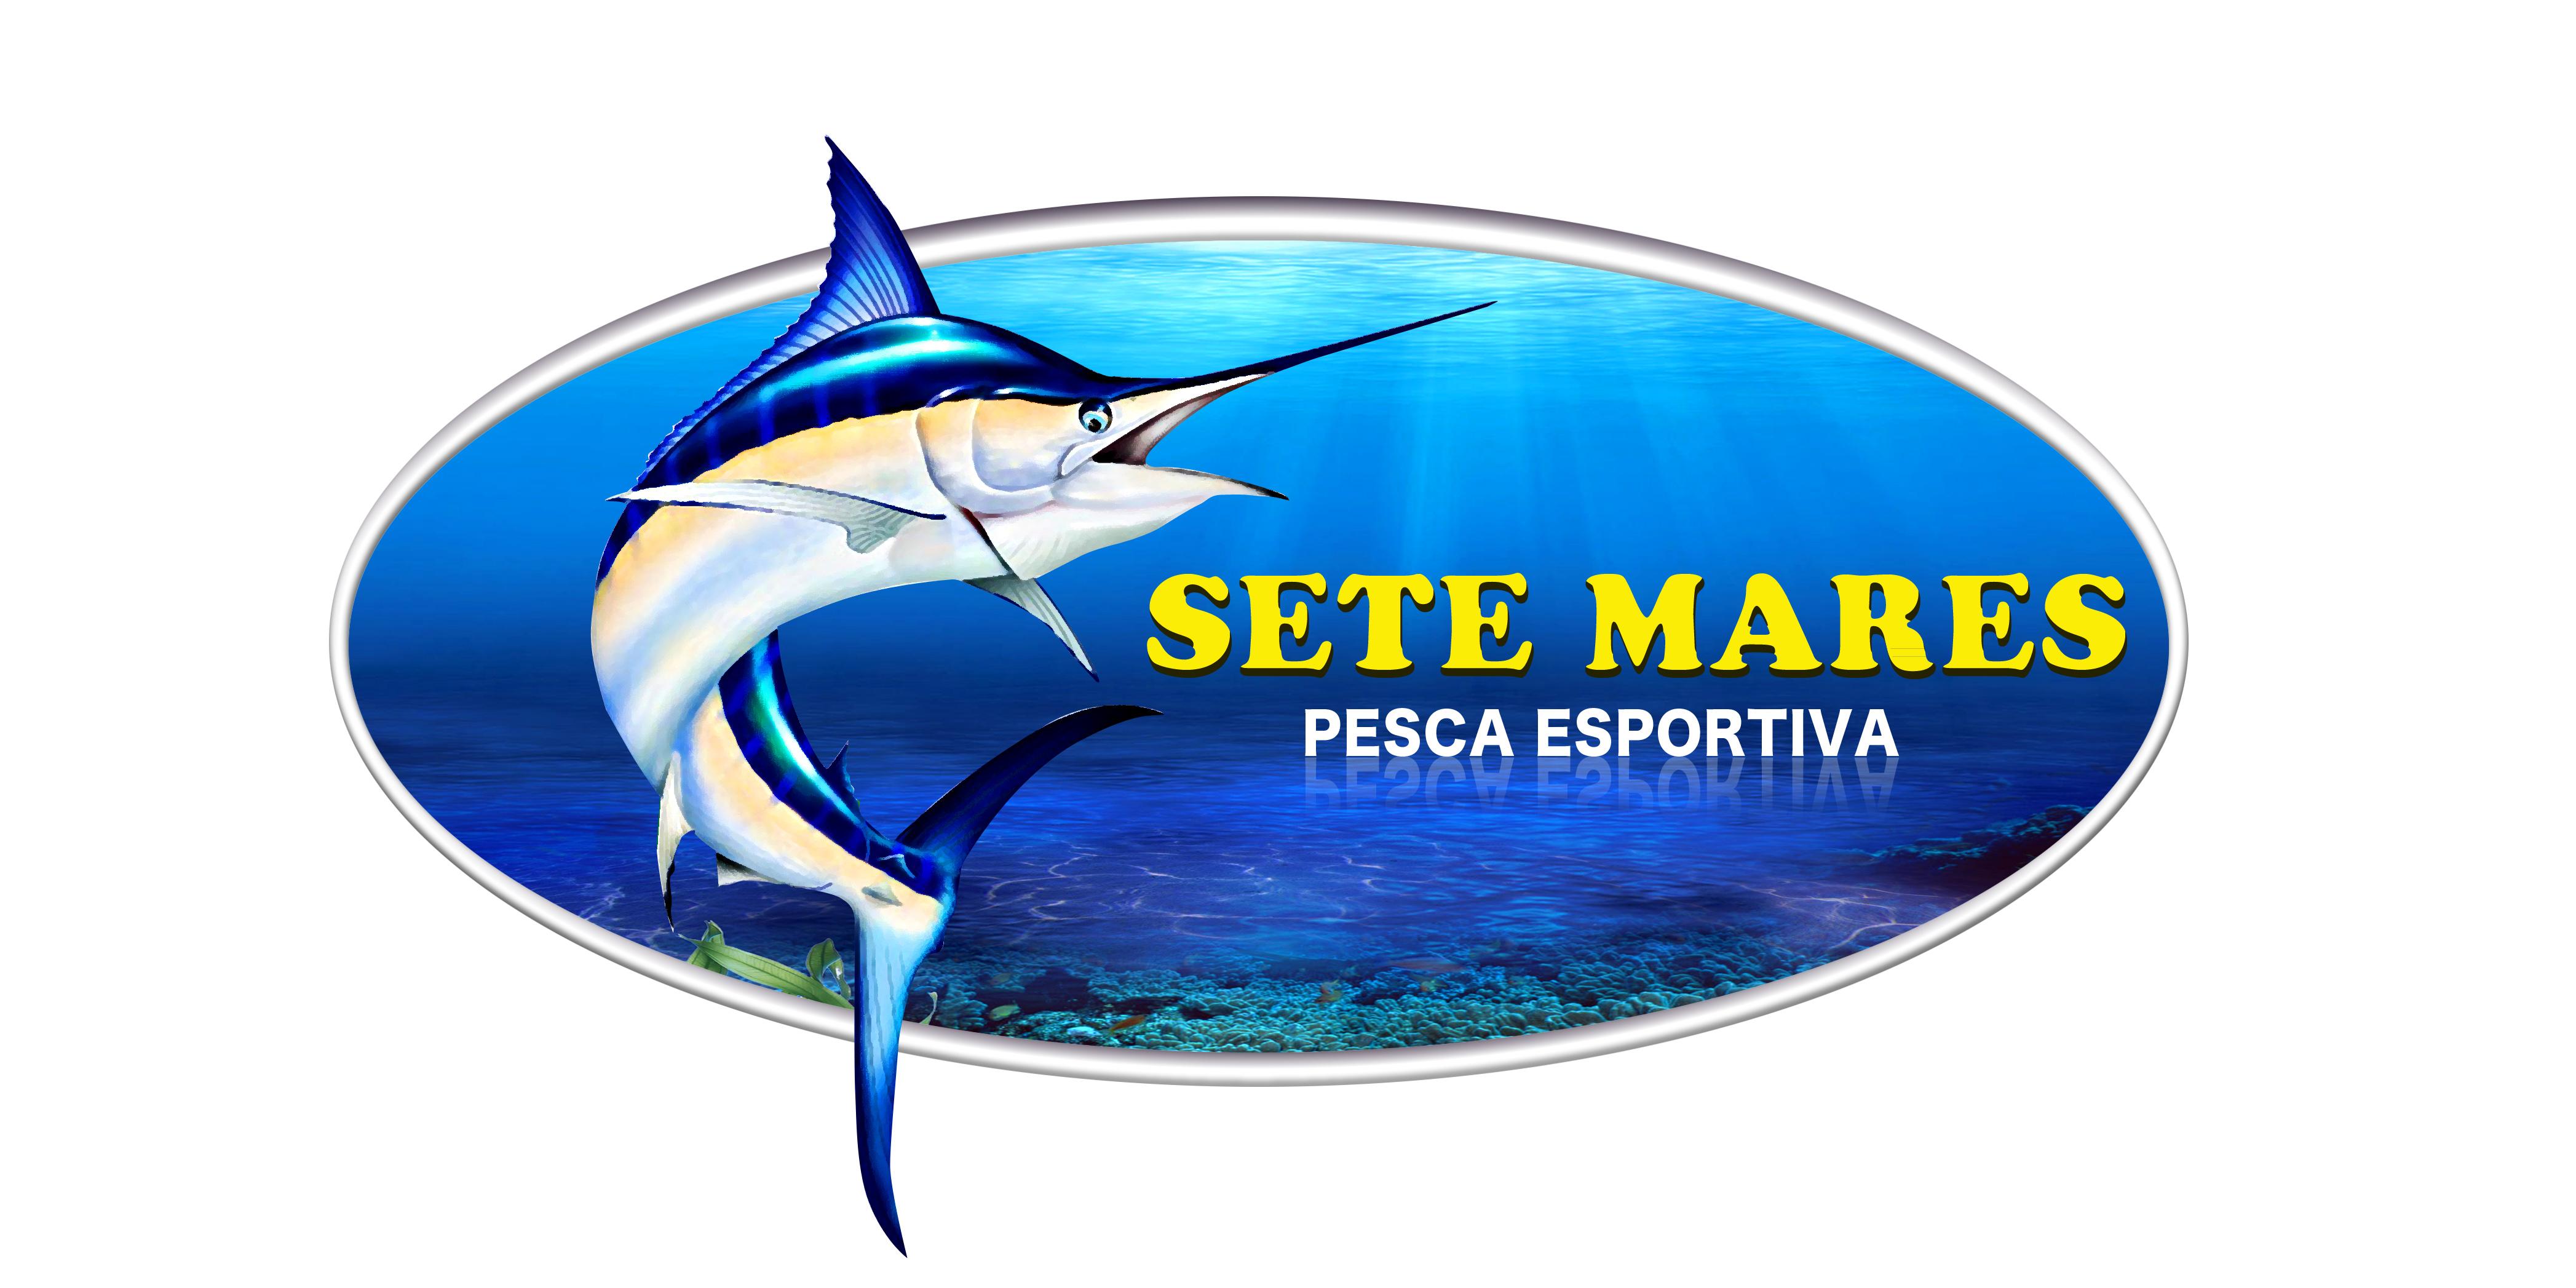 Sete_Mares.jpg